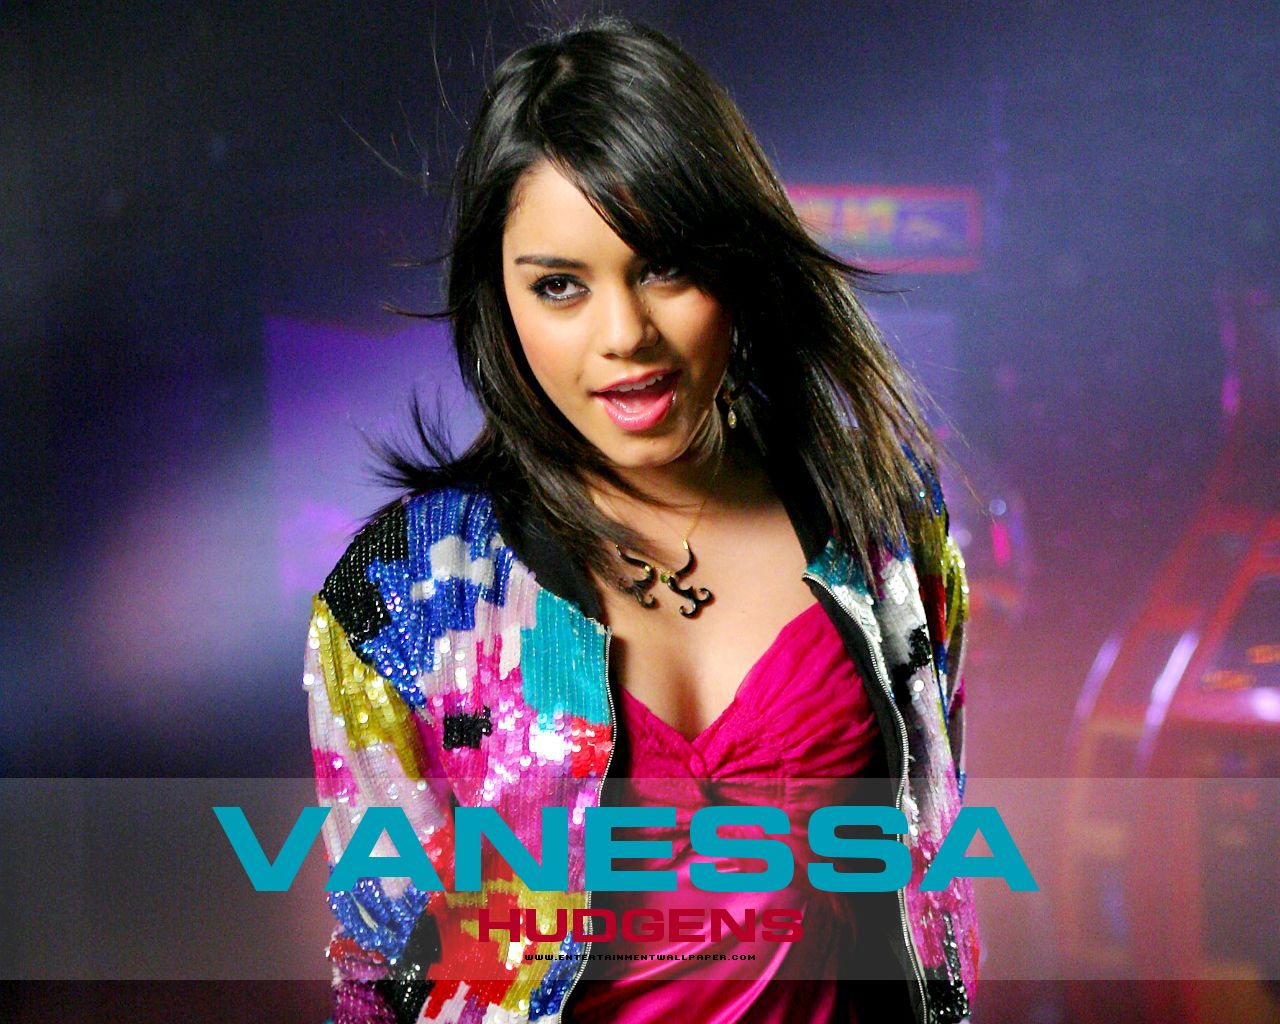 http://2.bp.blogspot.com/-mChnspO32nQ/T6BmnKJzbXI/AAAAAAAAChI/57tHRh9I3RU/s1600/Vanessa+Hudgens+wallpapers+2.jpg